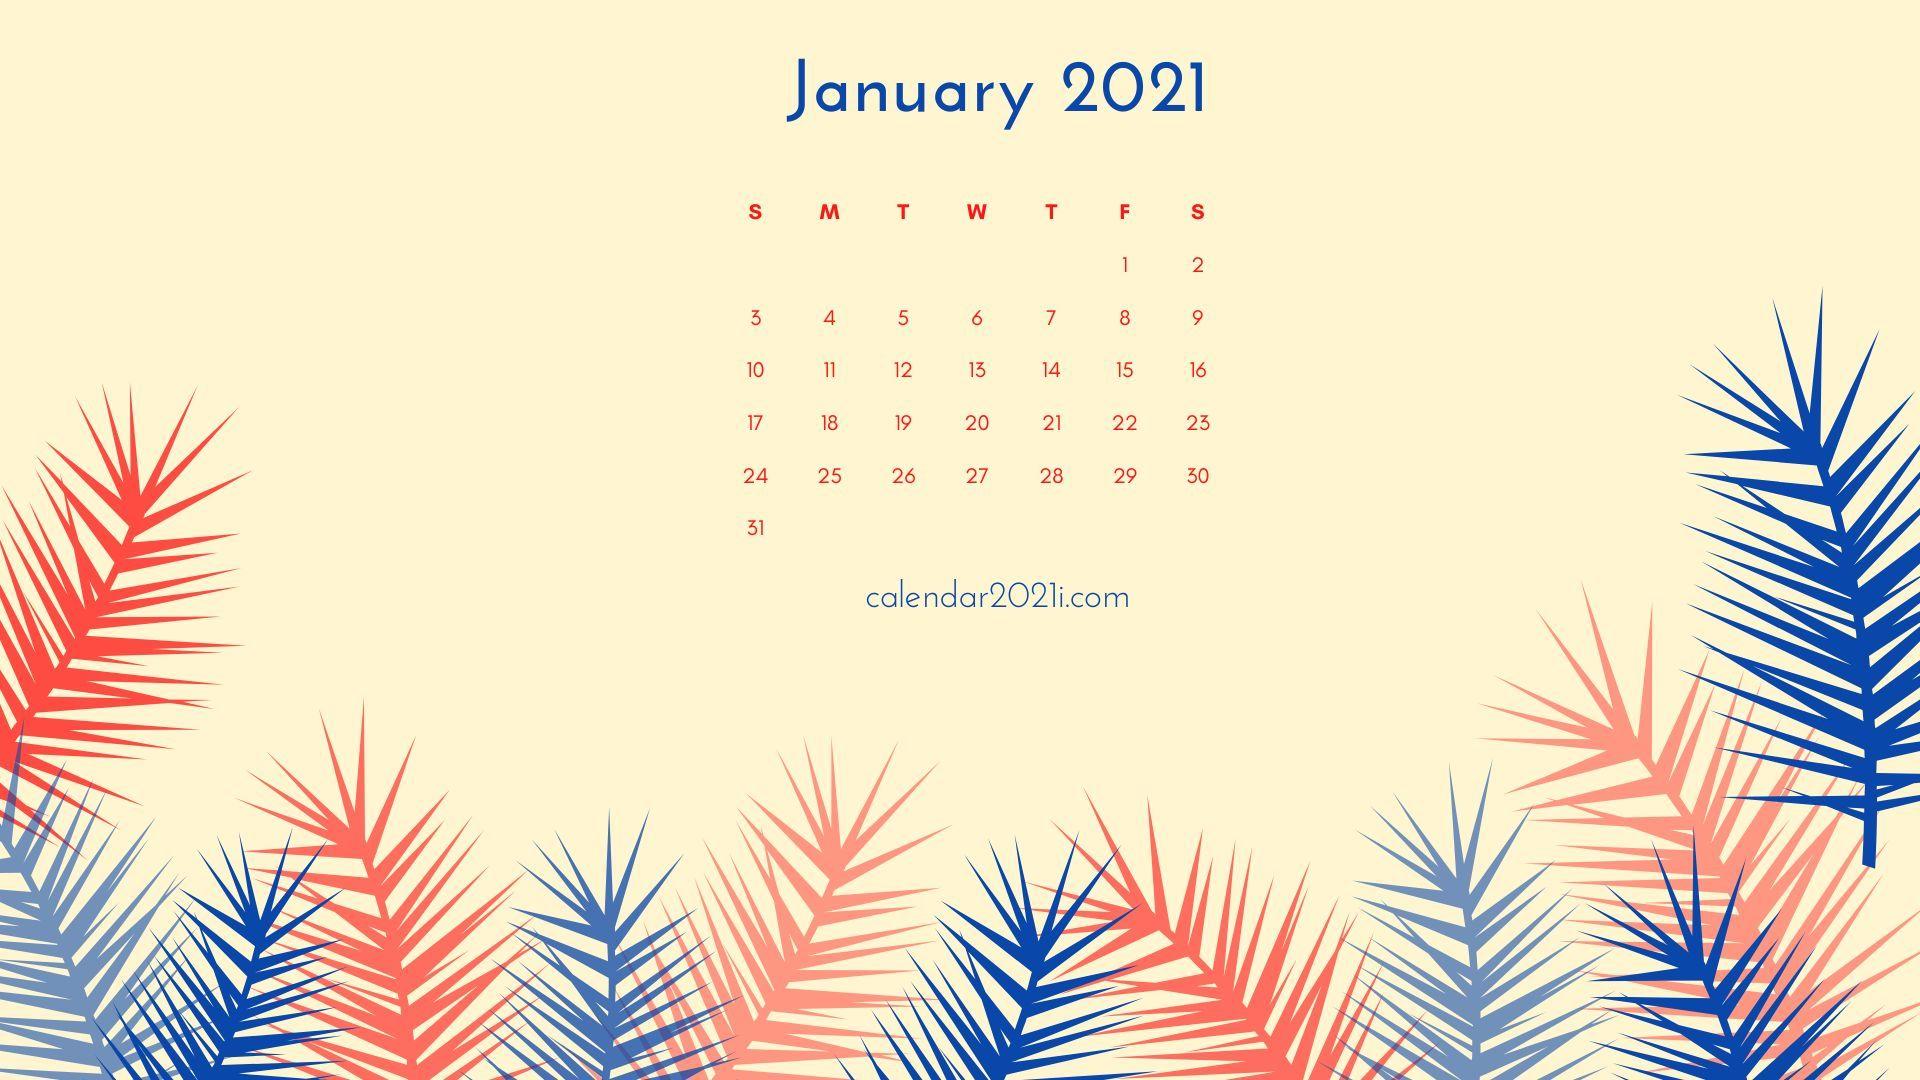 January 2021 Calendar Wallpaper In 2020 Calendar Wallpaper 2021 Calendar Cute Calendar